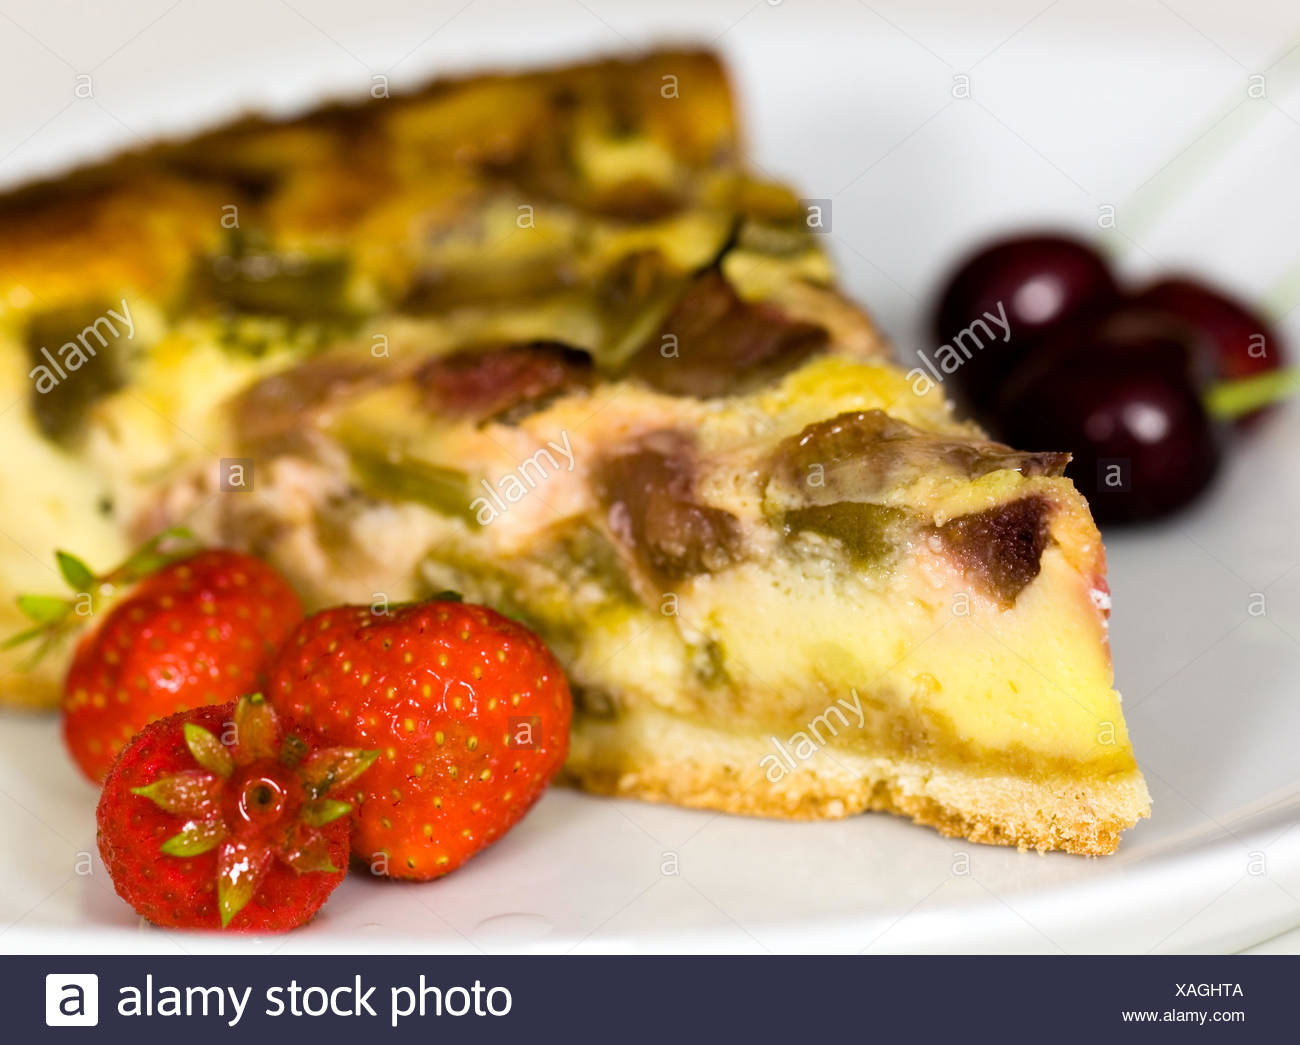 cake from the rhubarb,rheum rhabarbarum - Stock Image